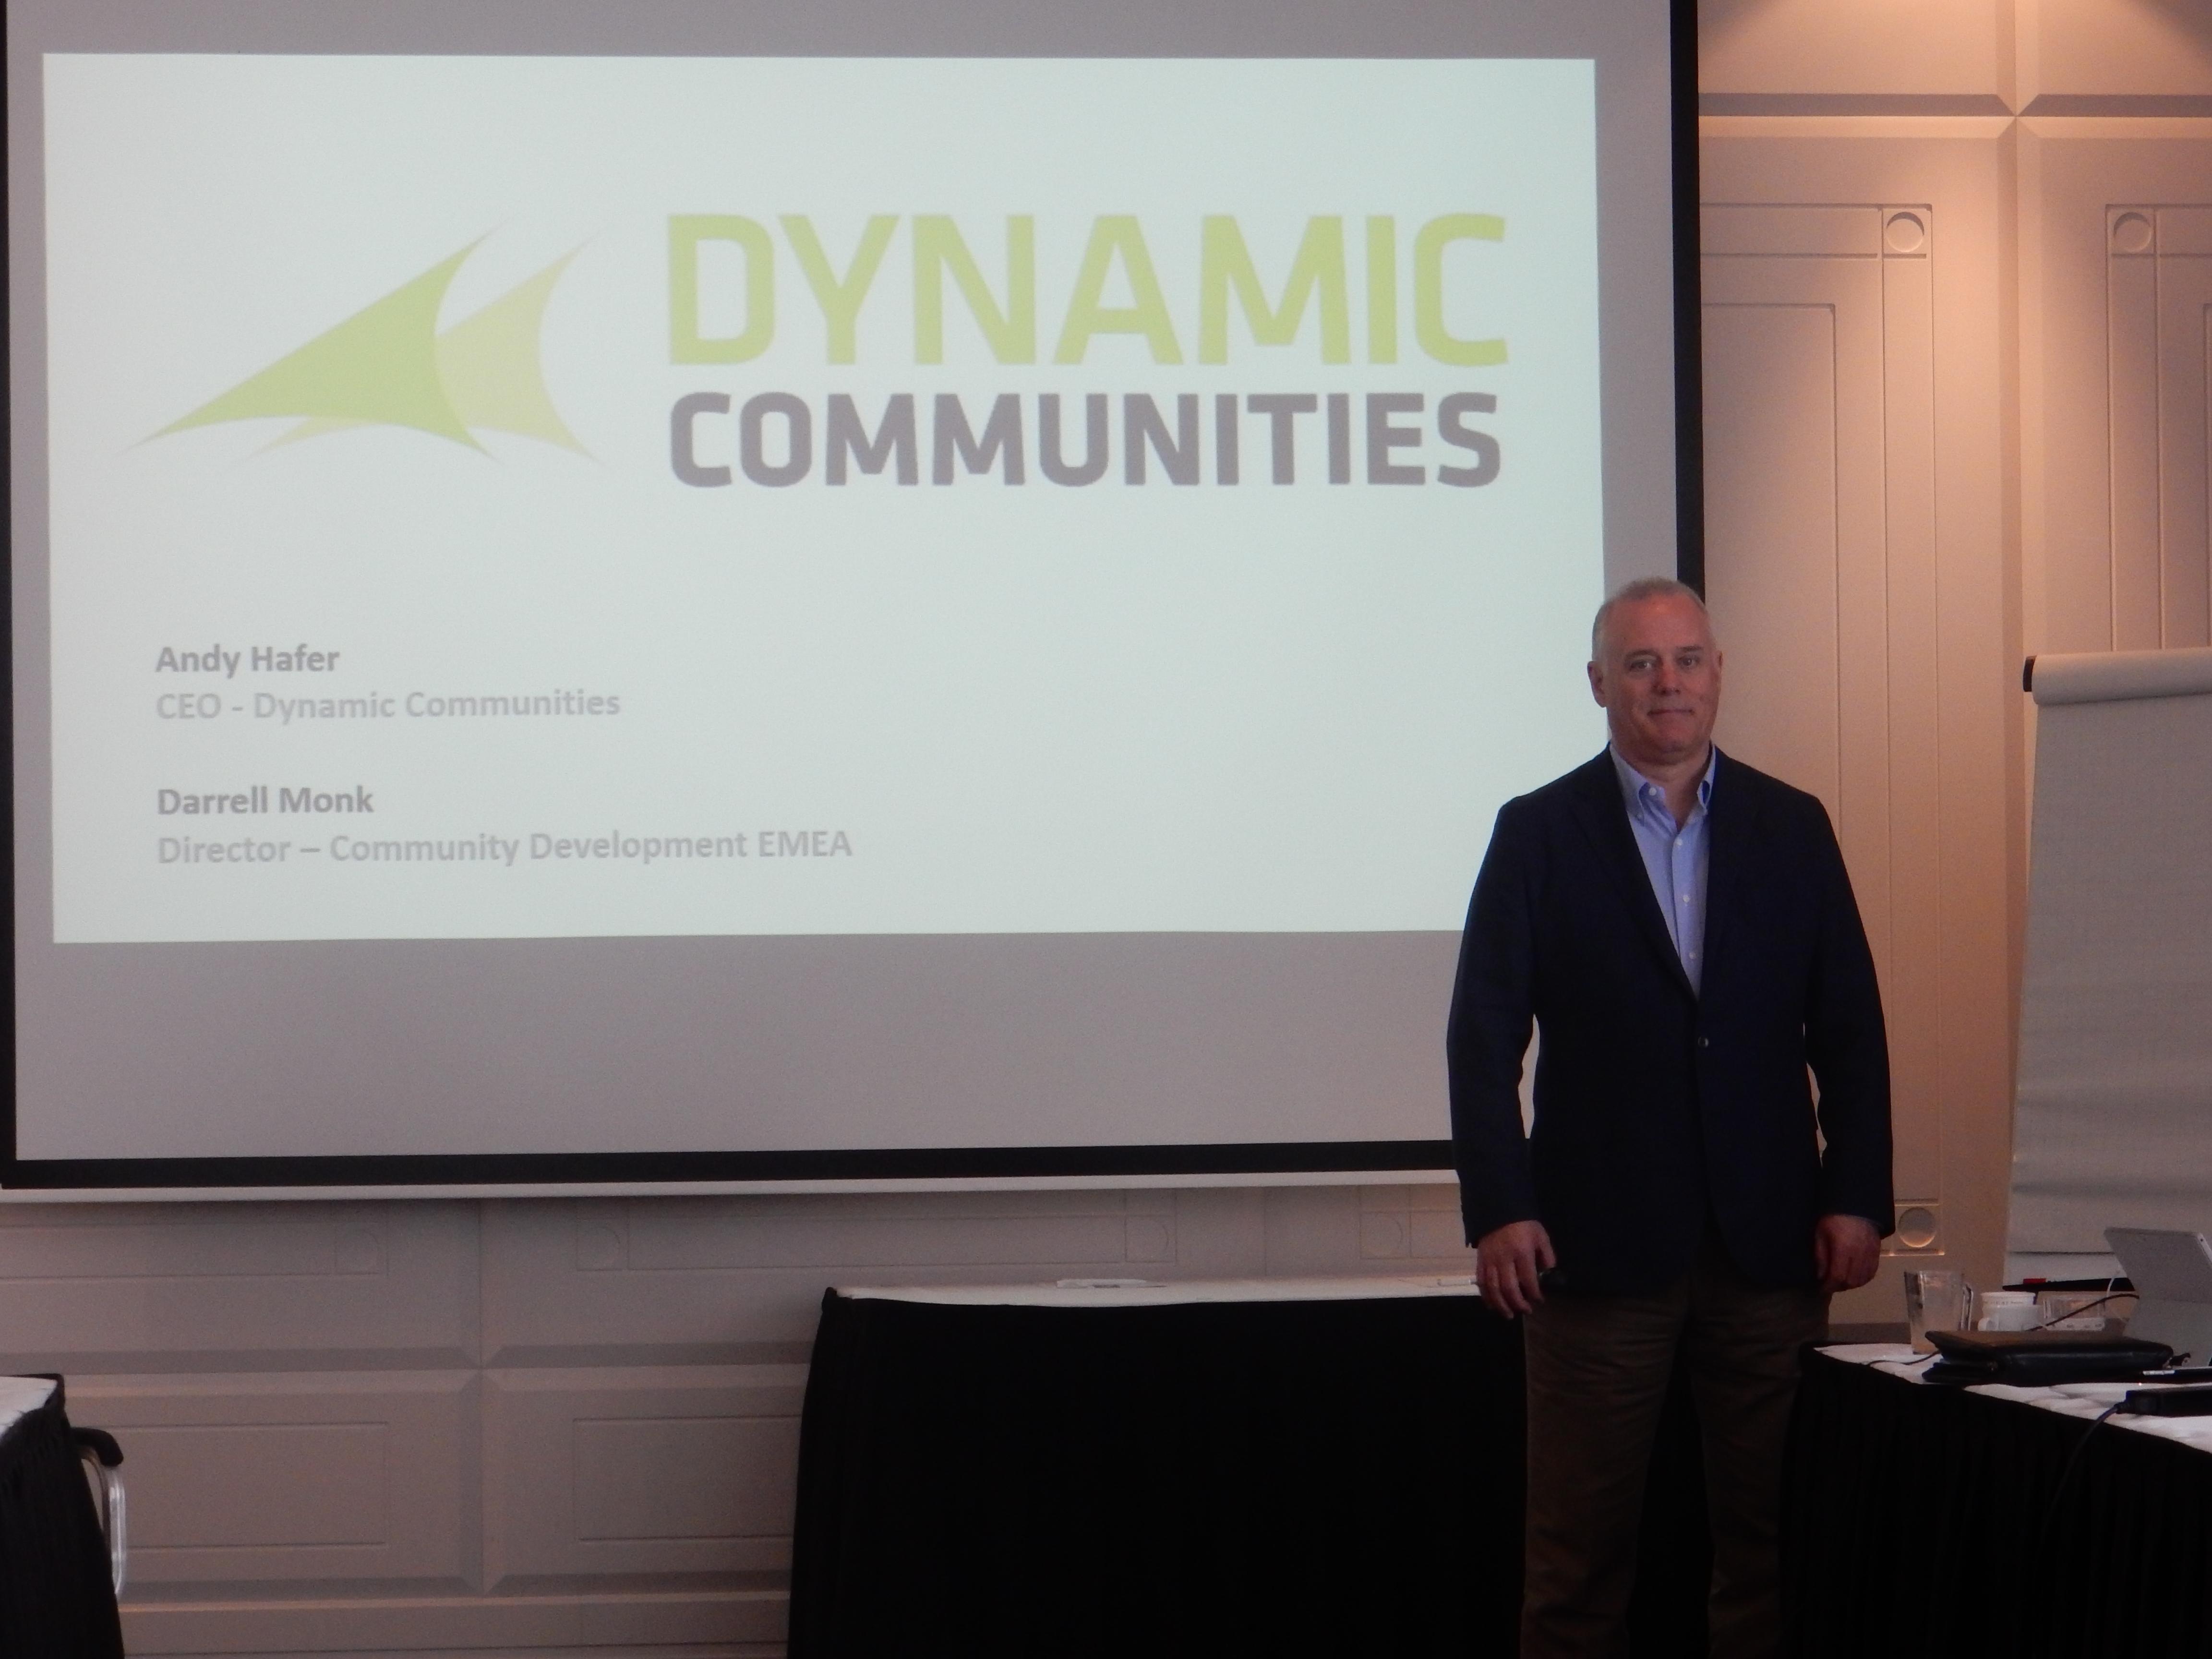 Dynamics Community